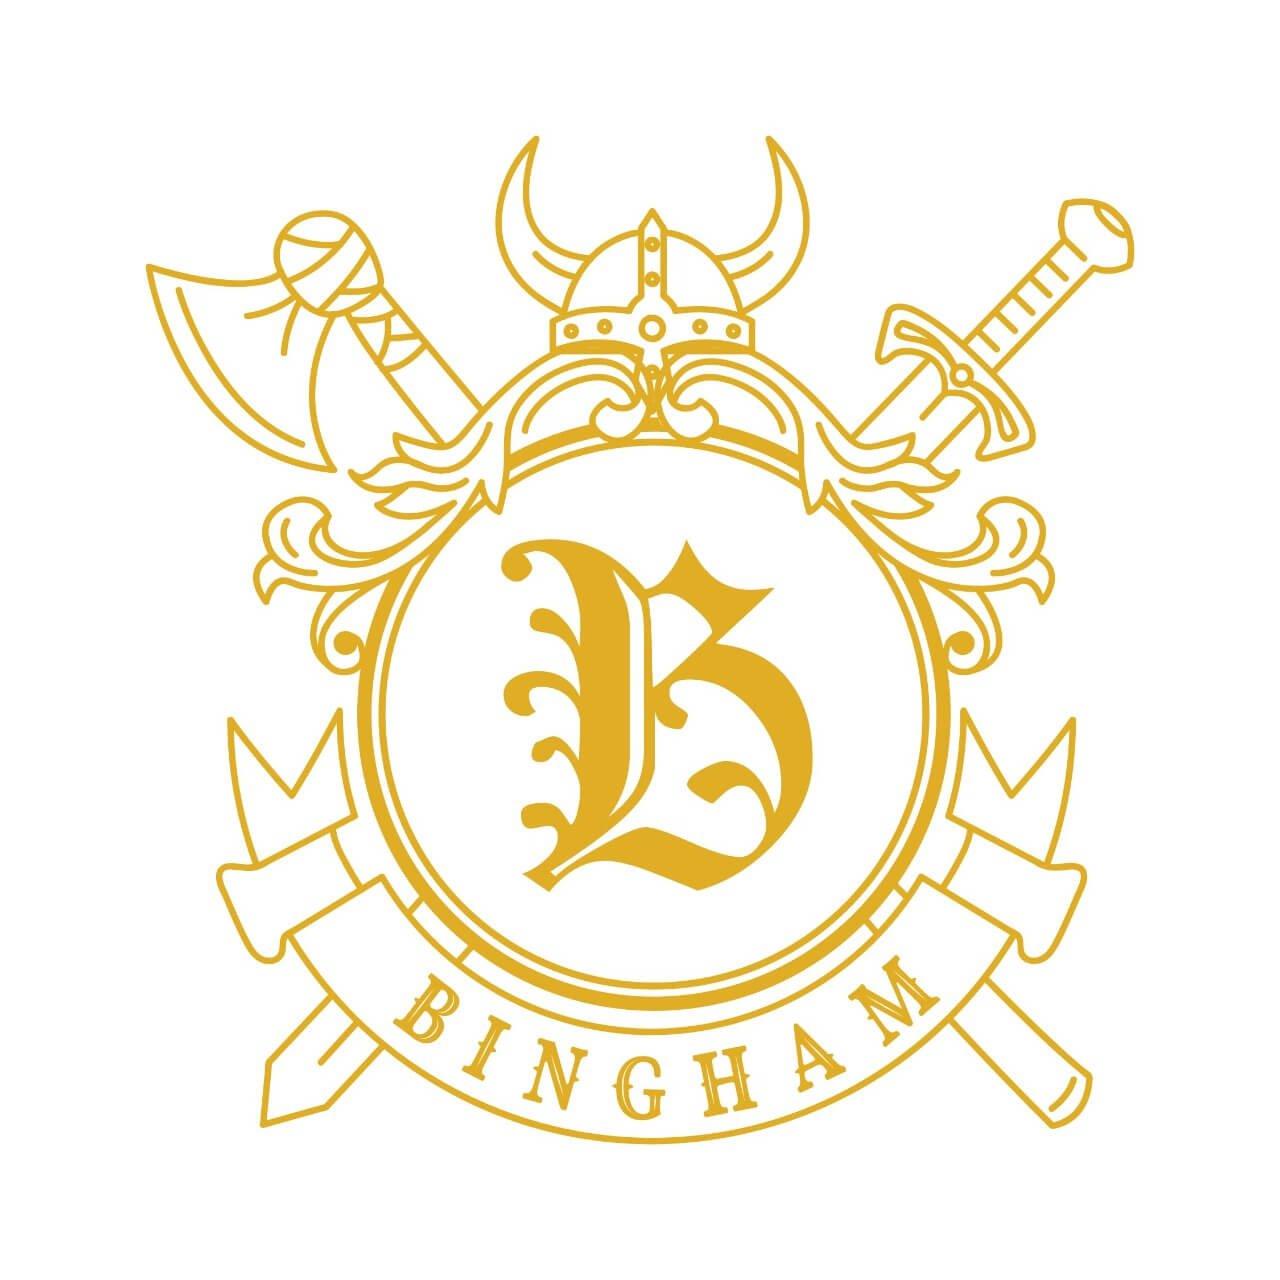 House of Bingham